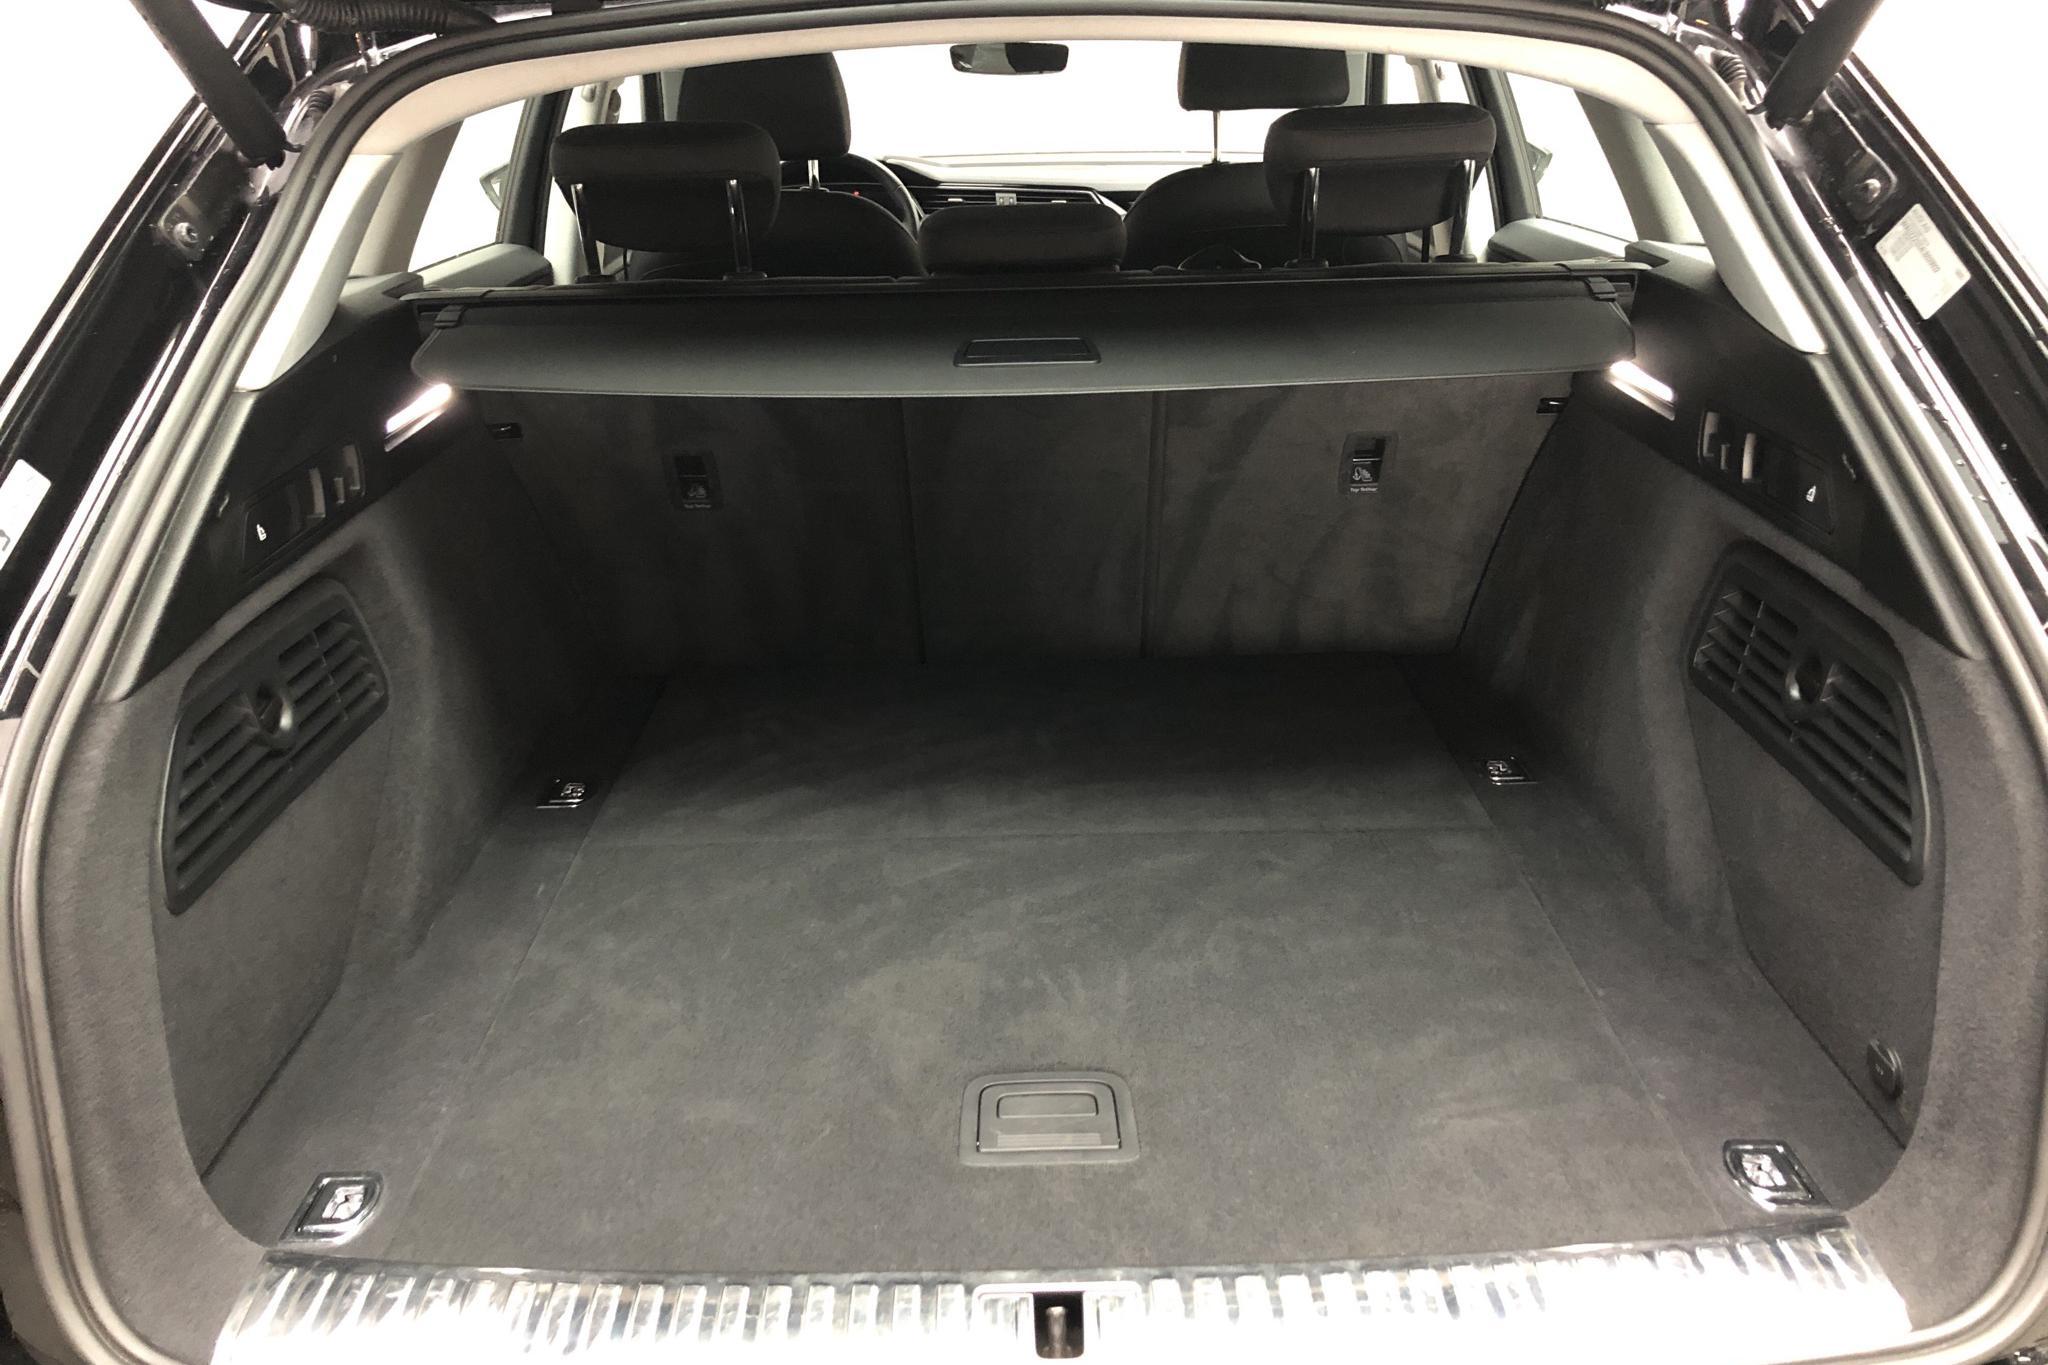 Audi e-tron 50 quattro 71 kWh (288hk) - 23 050 km - Automatic - black - 2020